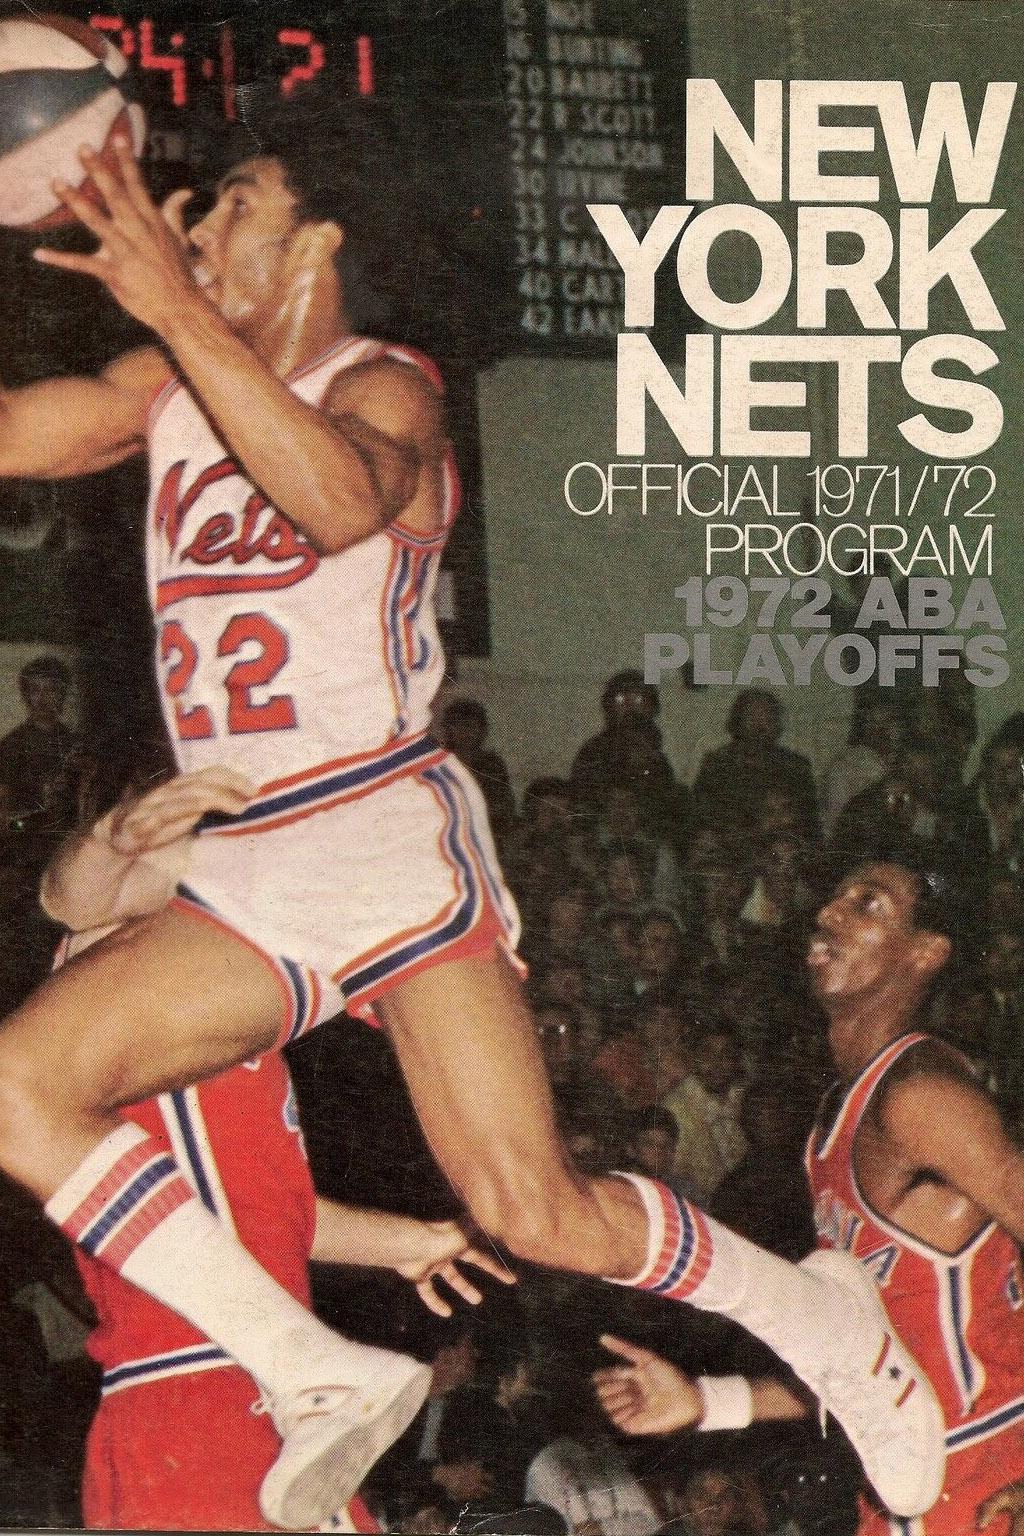 1972 New York Nets season